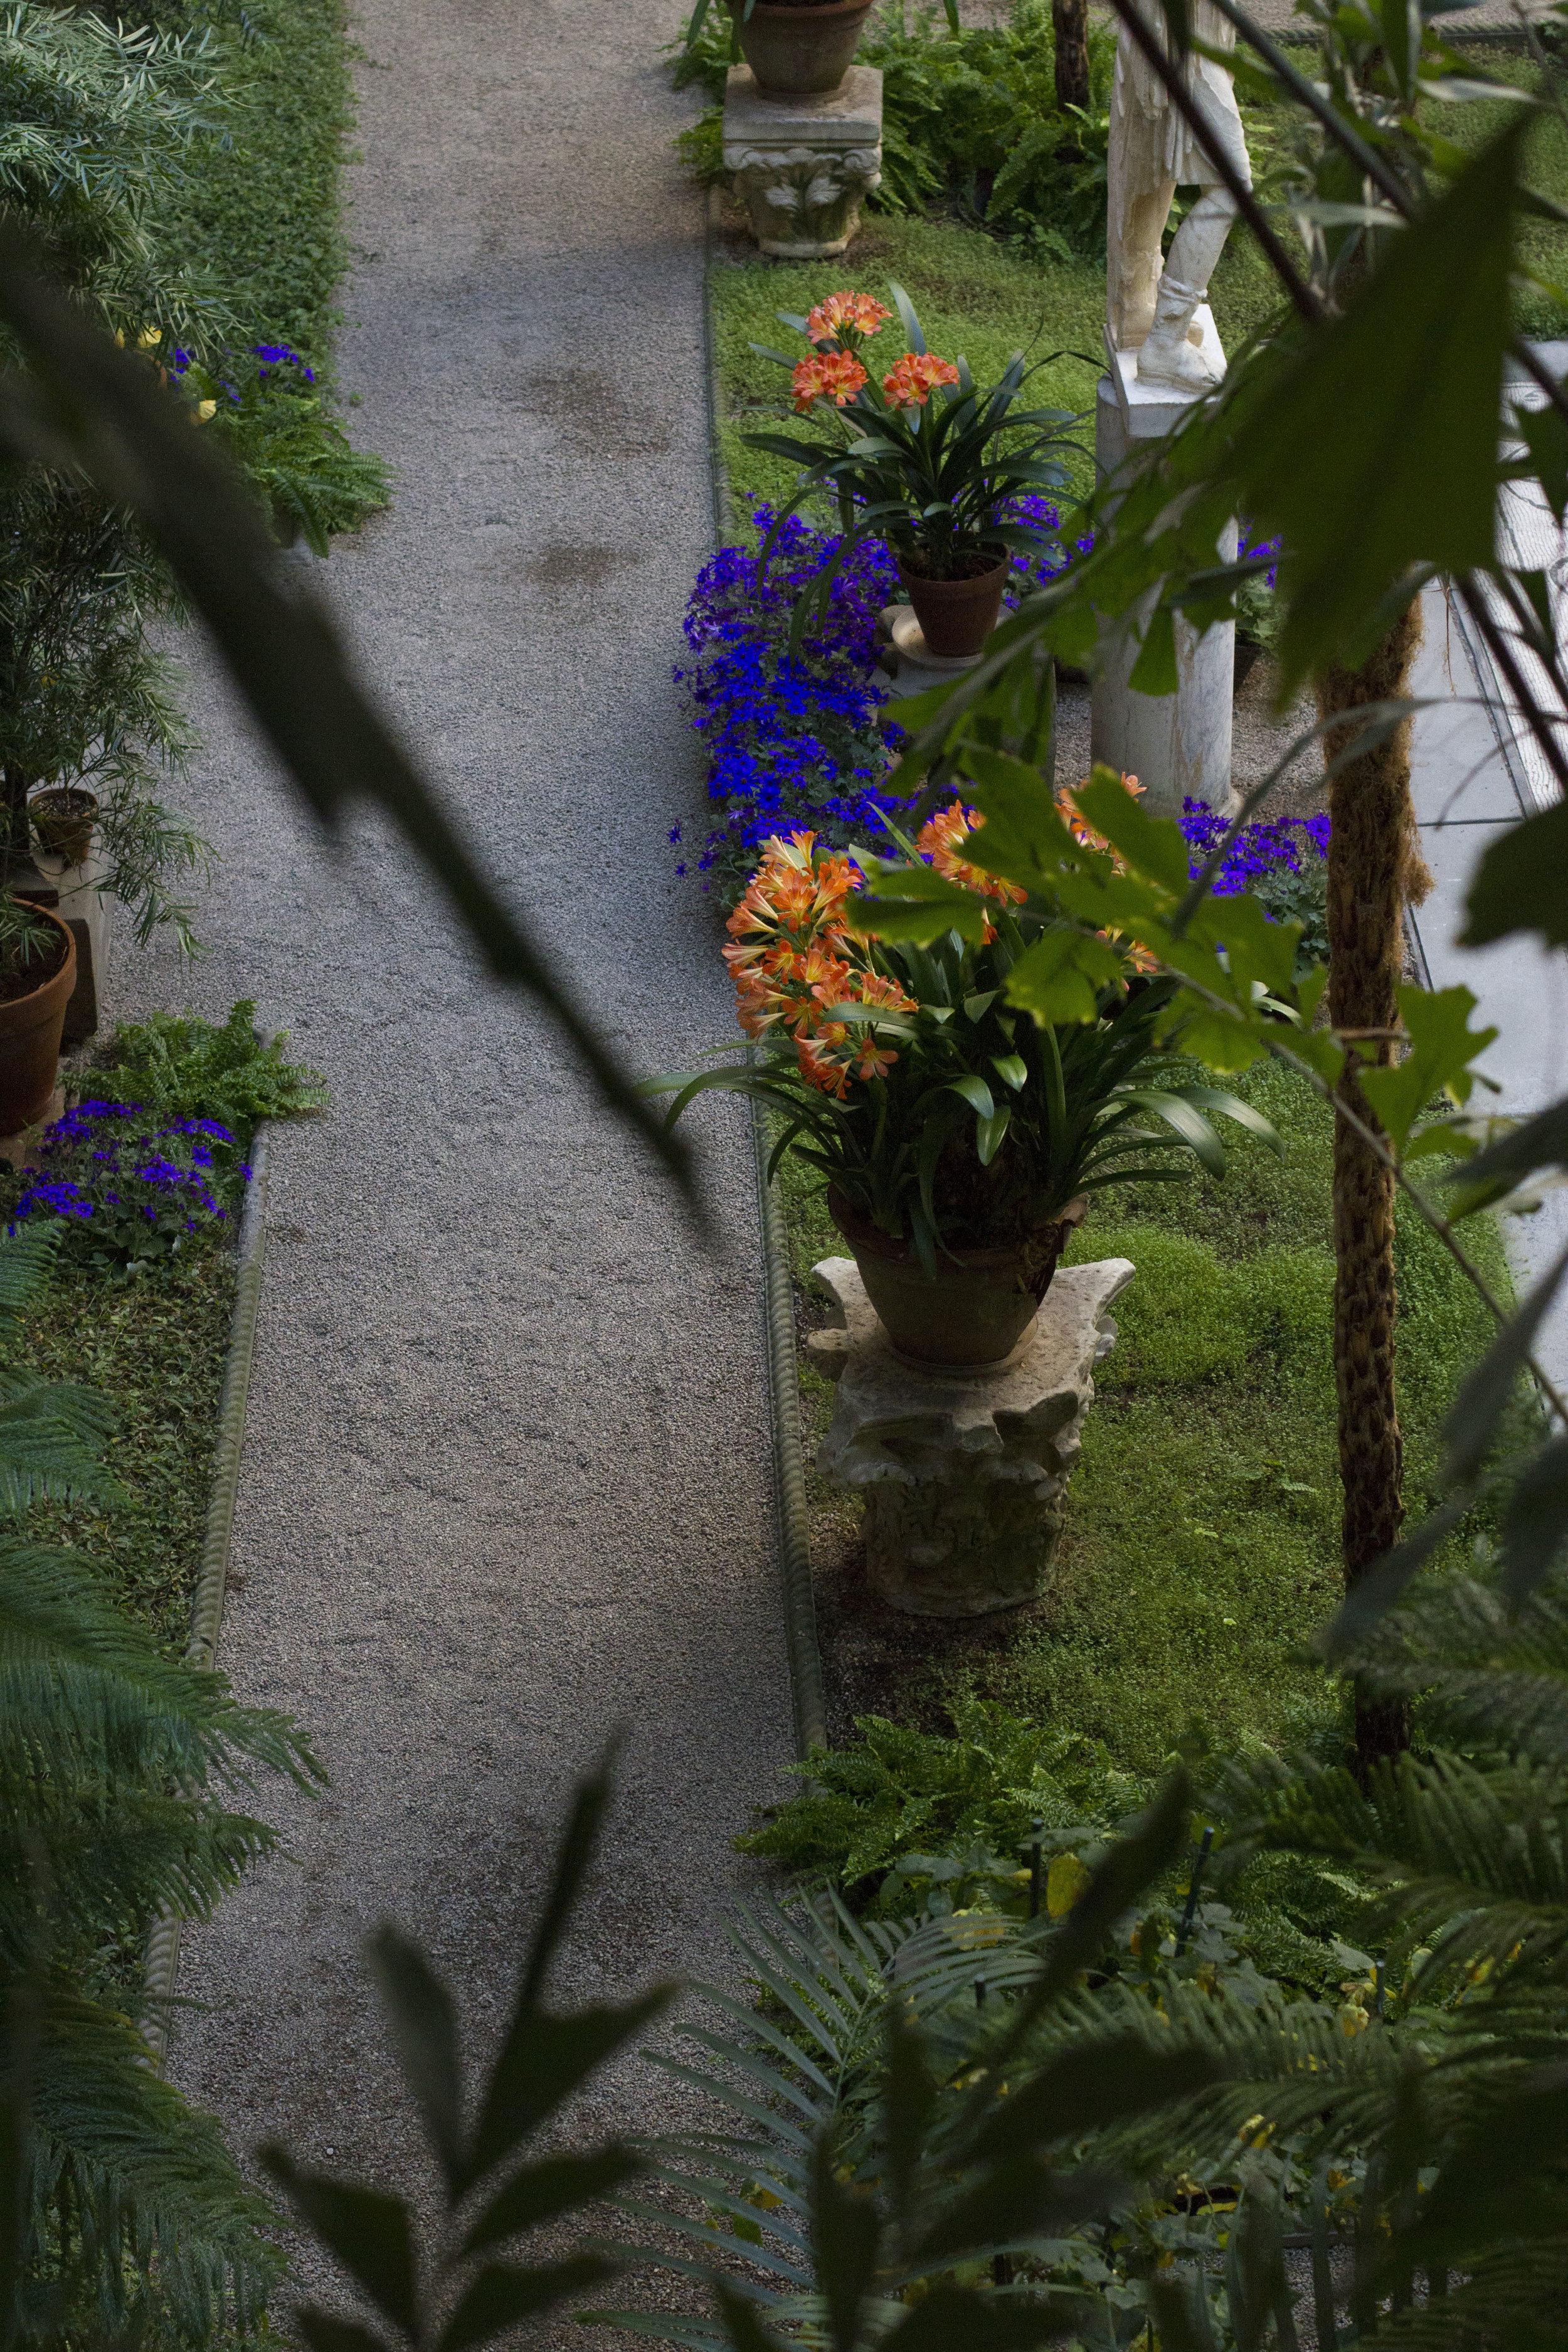 courtyard plants and path .jpg